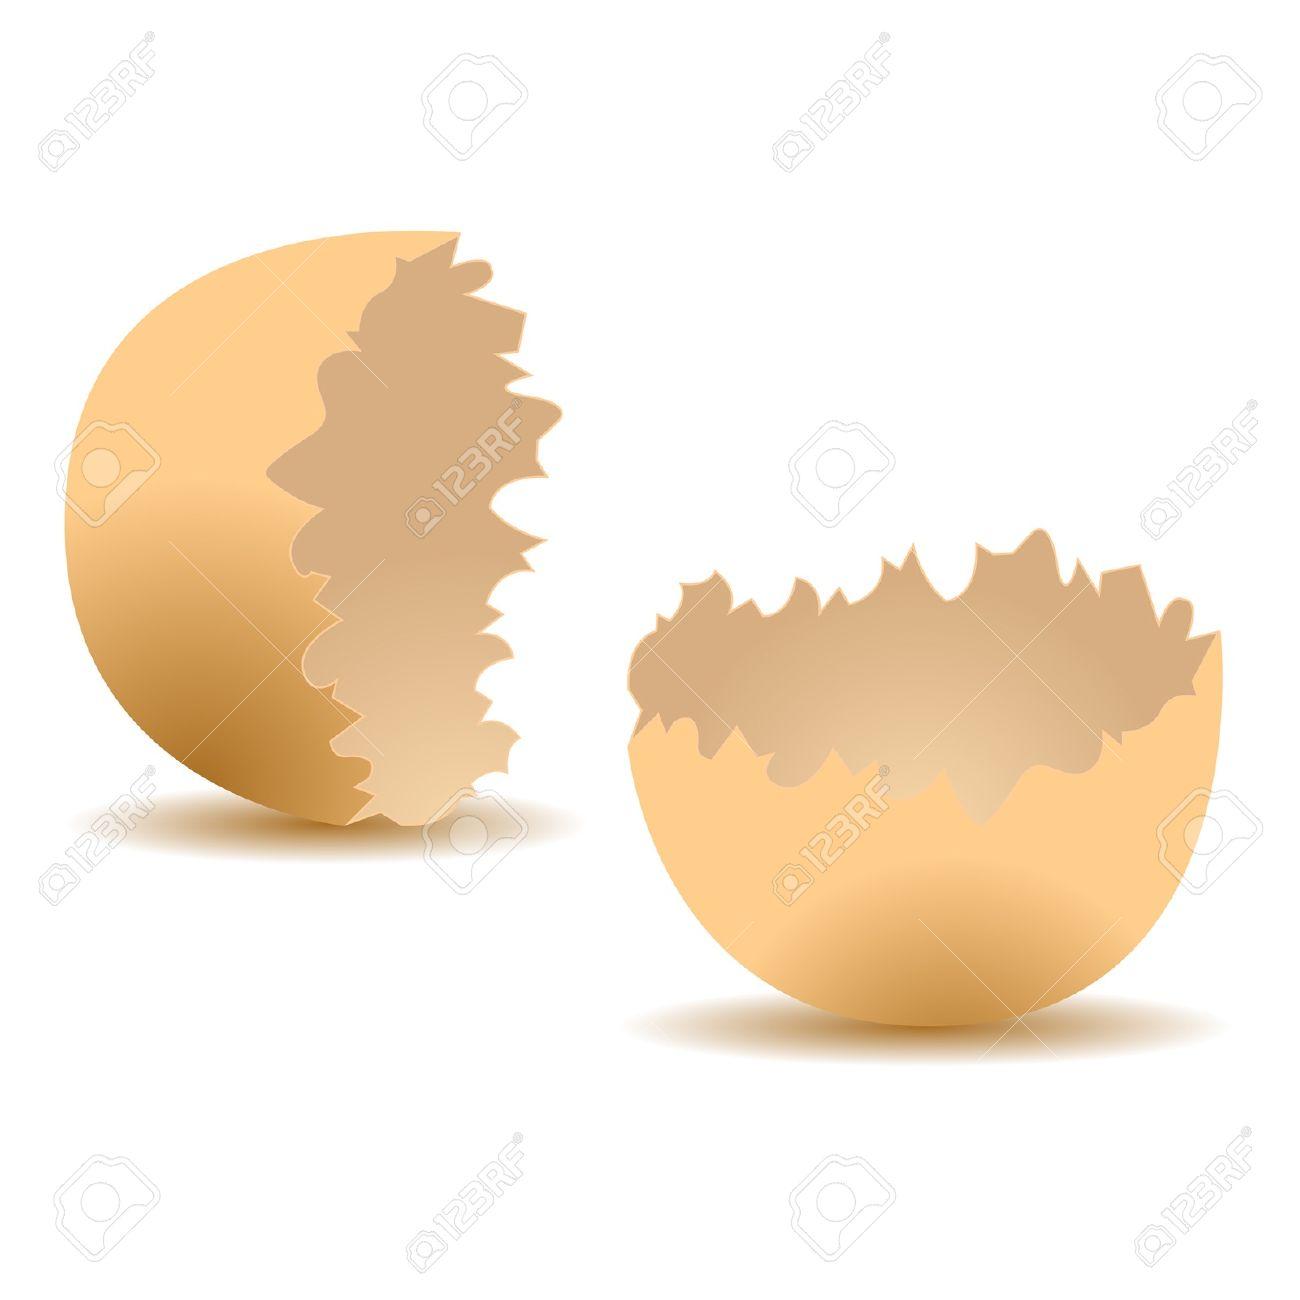 Cracked Egg Shell Isolated Over White Background Royalty Free.